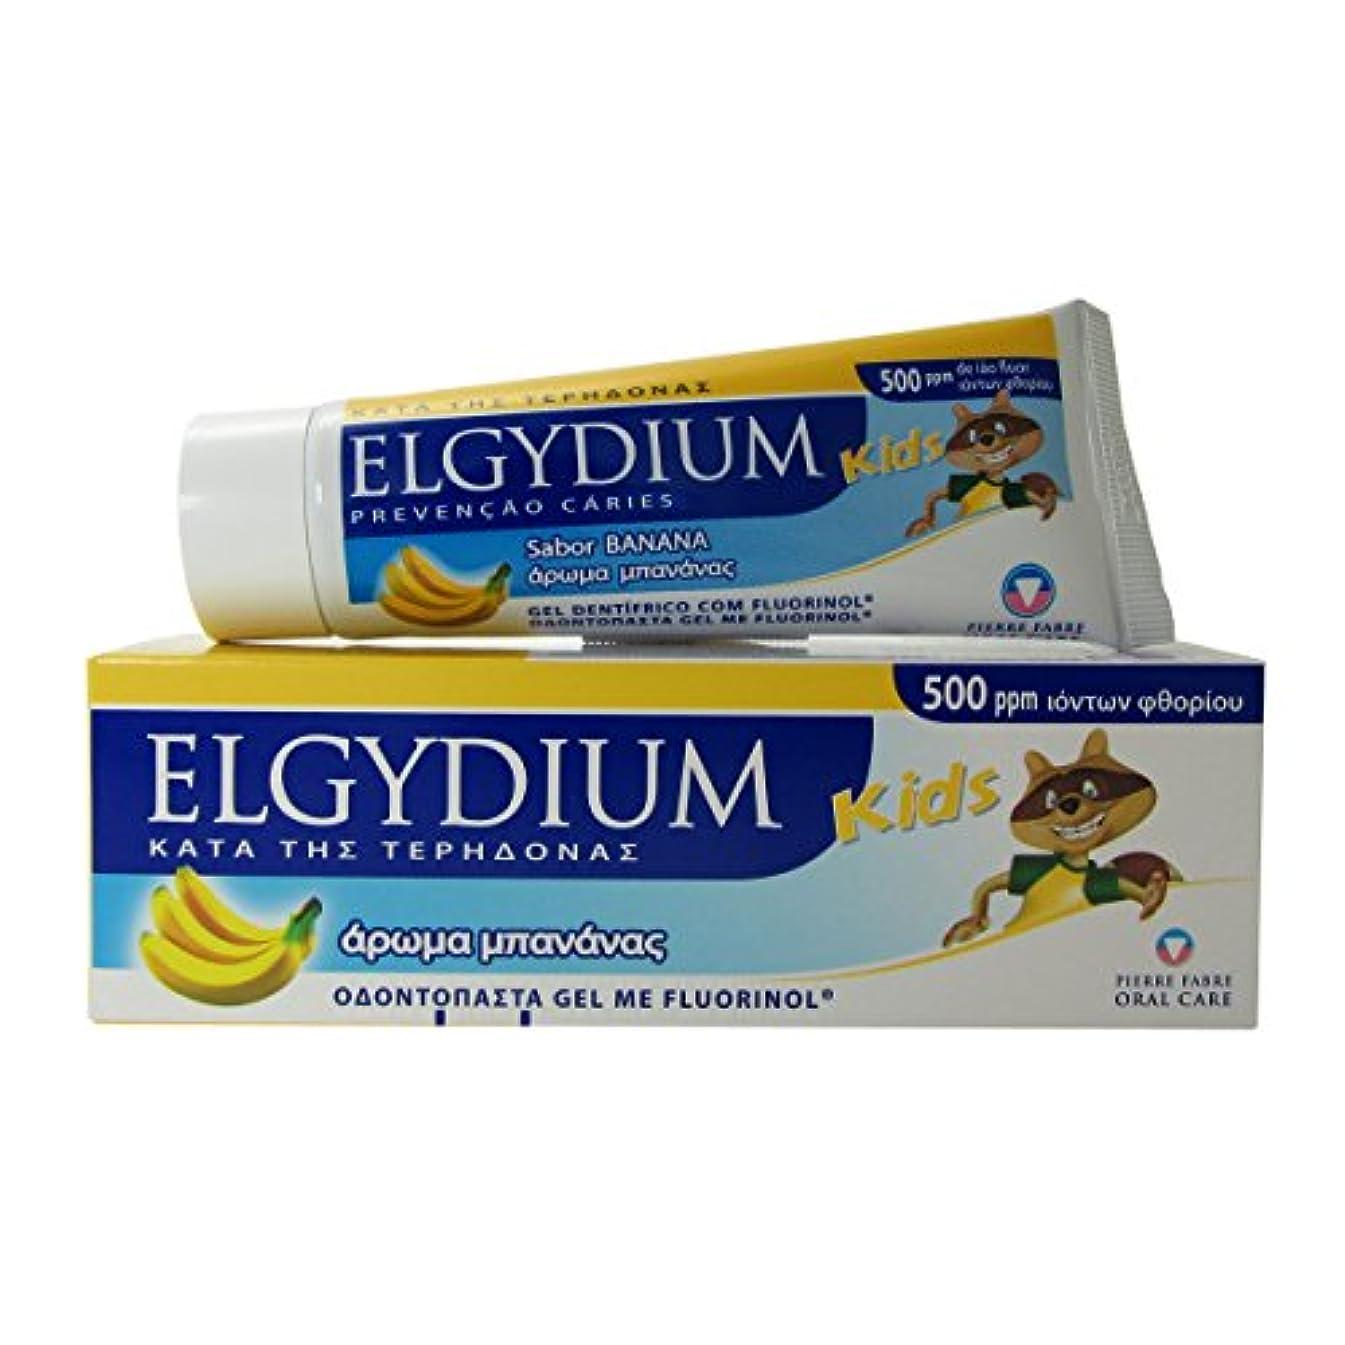 収入手綱科学的Elgydium Kids Gel Toothpaste Banana Flavor 50ml [並行輸入品]